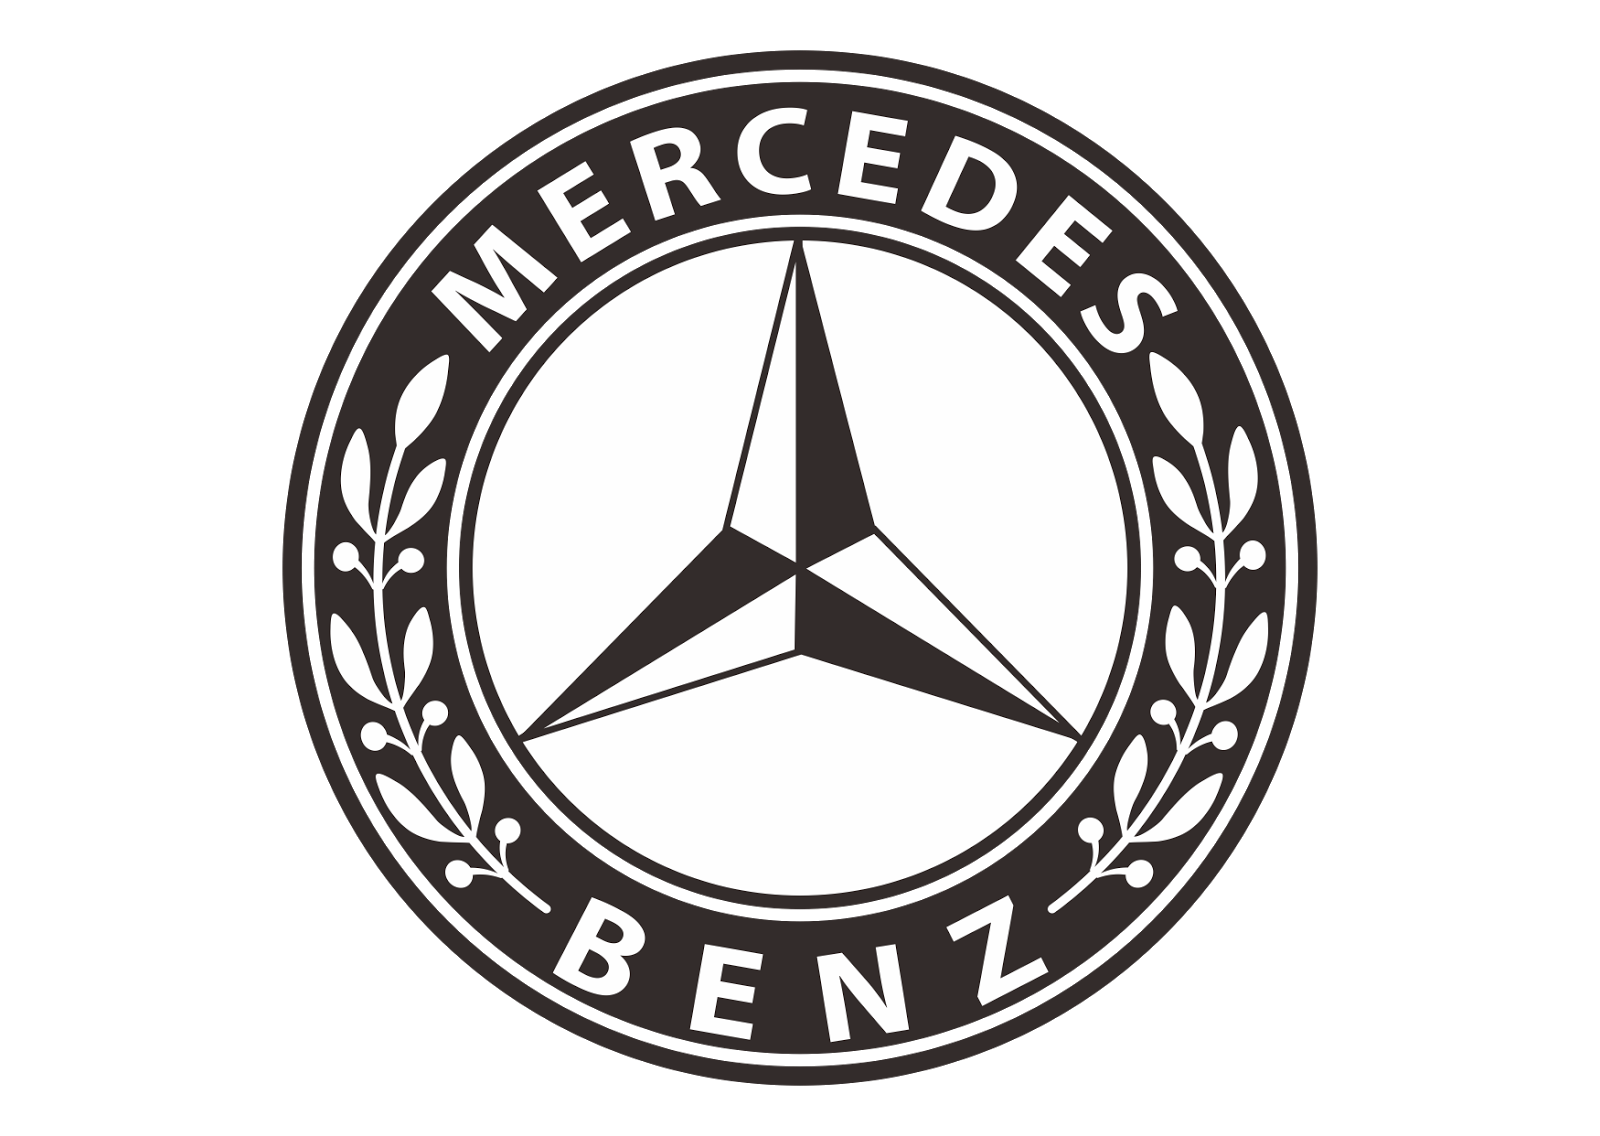 Mercedes benz logo vector design part 2 format cdr ai for Mercedes benz logo vector